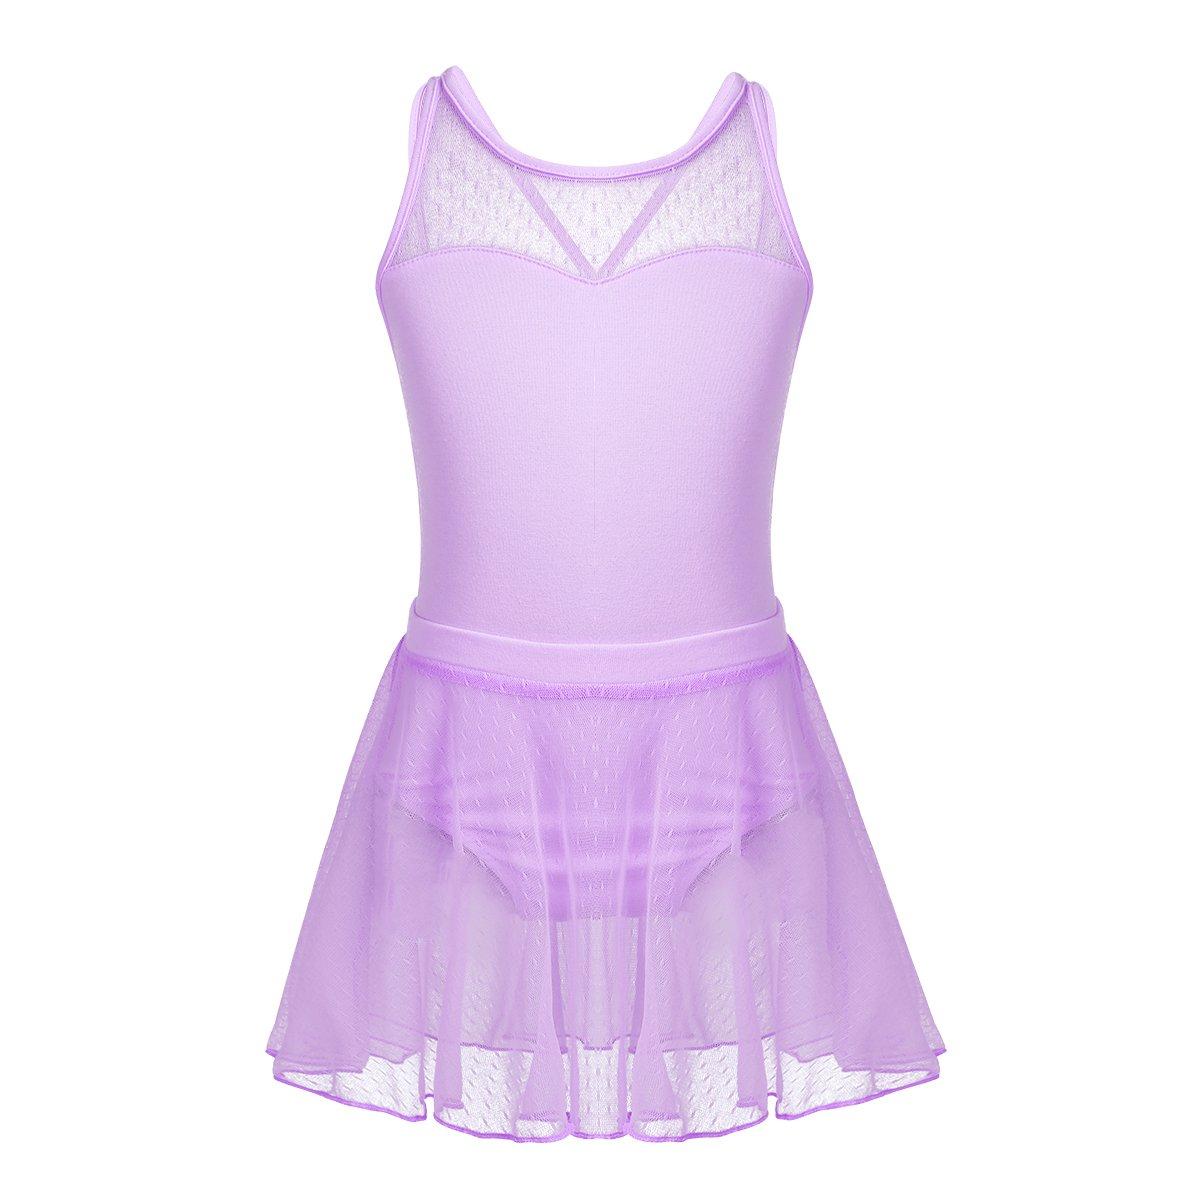 Agoky Girls Camisole Sleeveless Crisscross Back Tutu Dress Ballet Gym Leotard Uniform